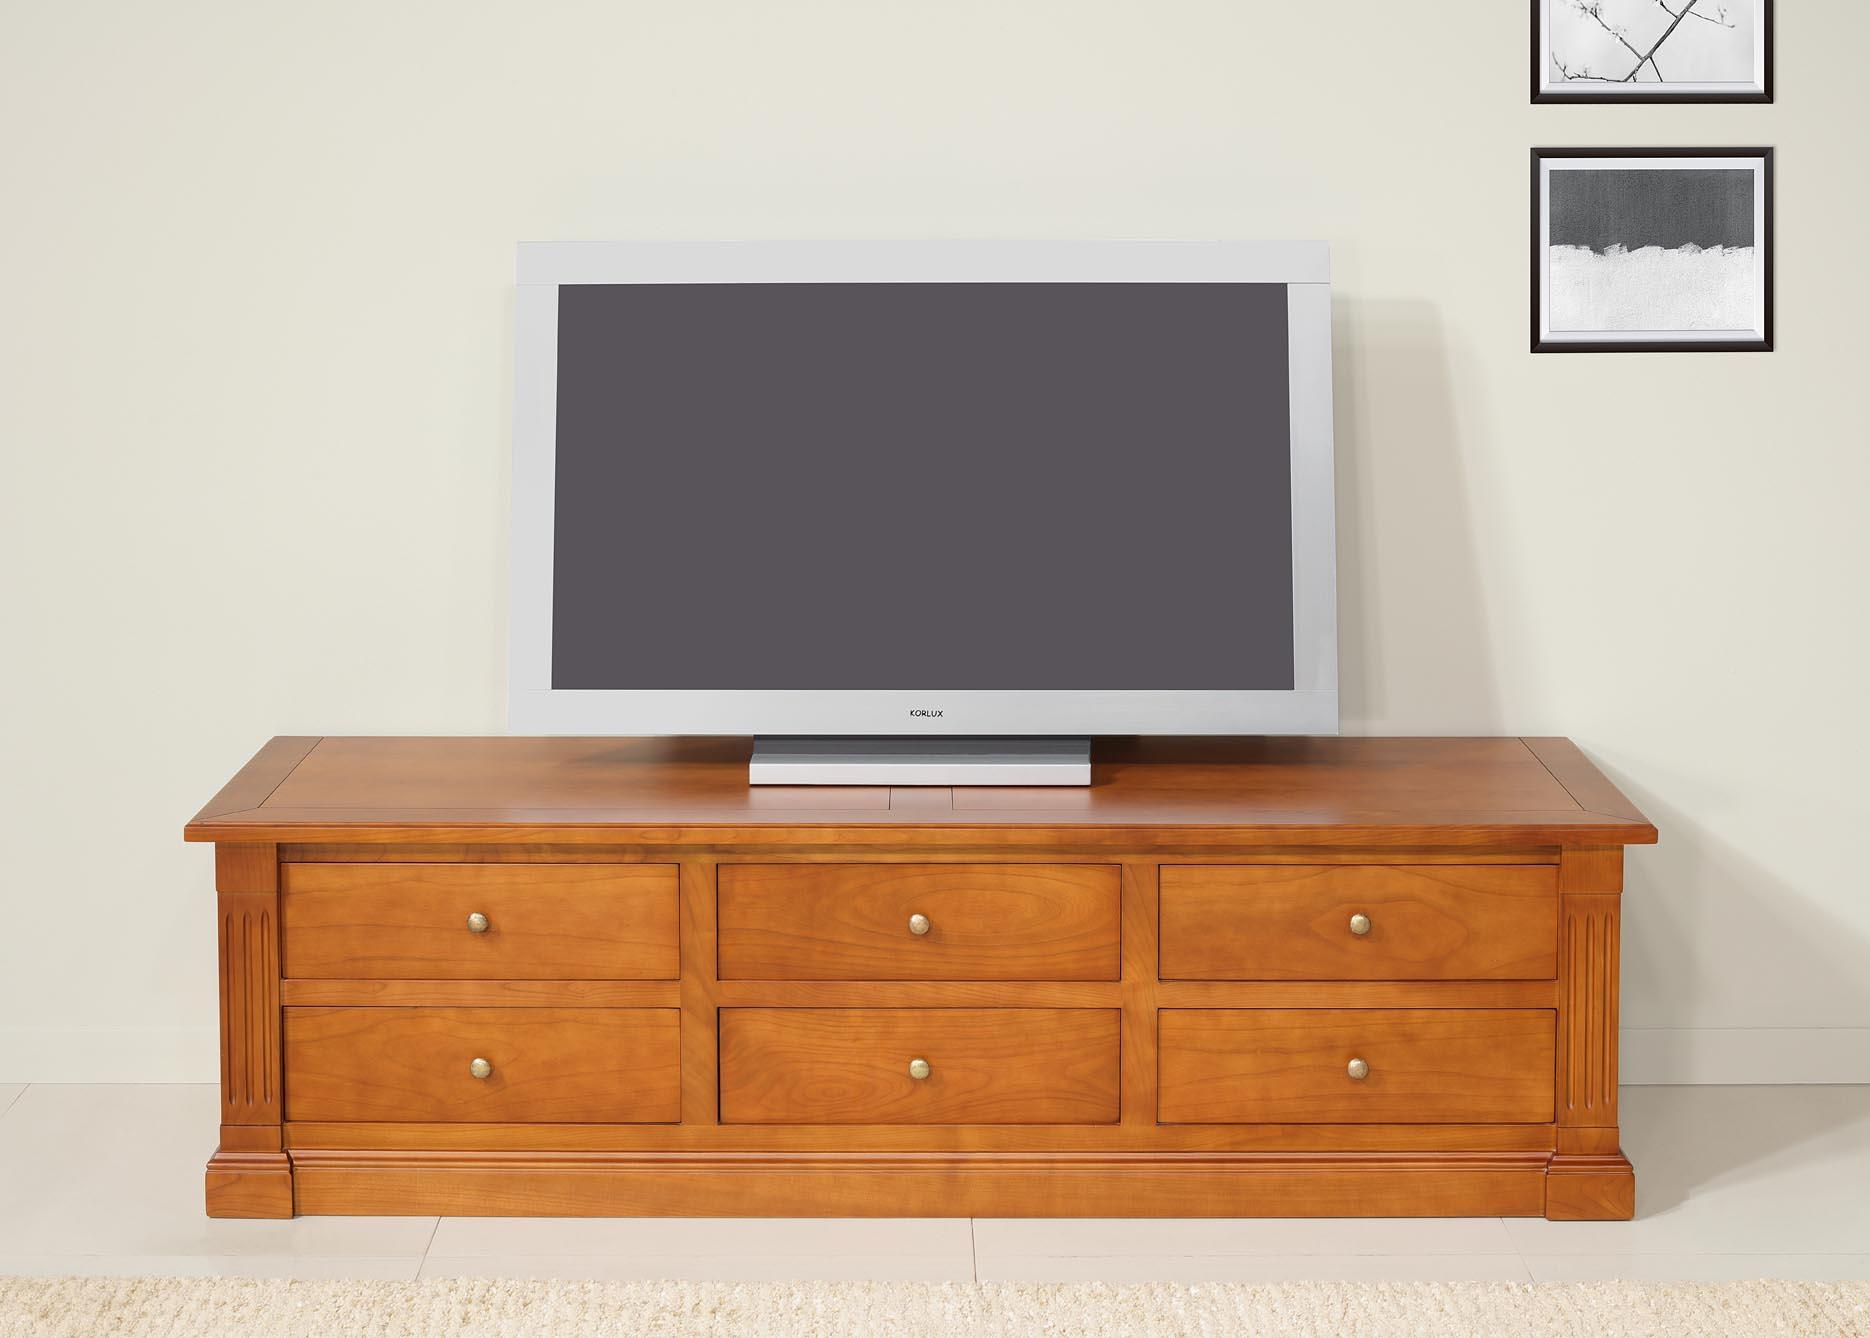 meuble tv 16 eme laurence en merisier de style directoire longueur 170 cm meuble en merisier